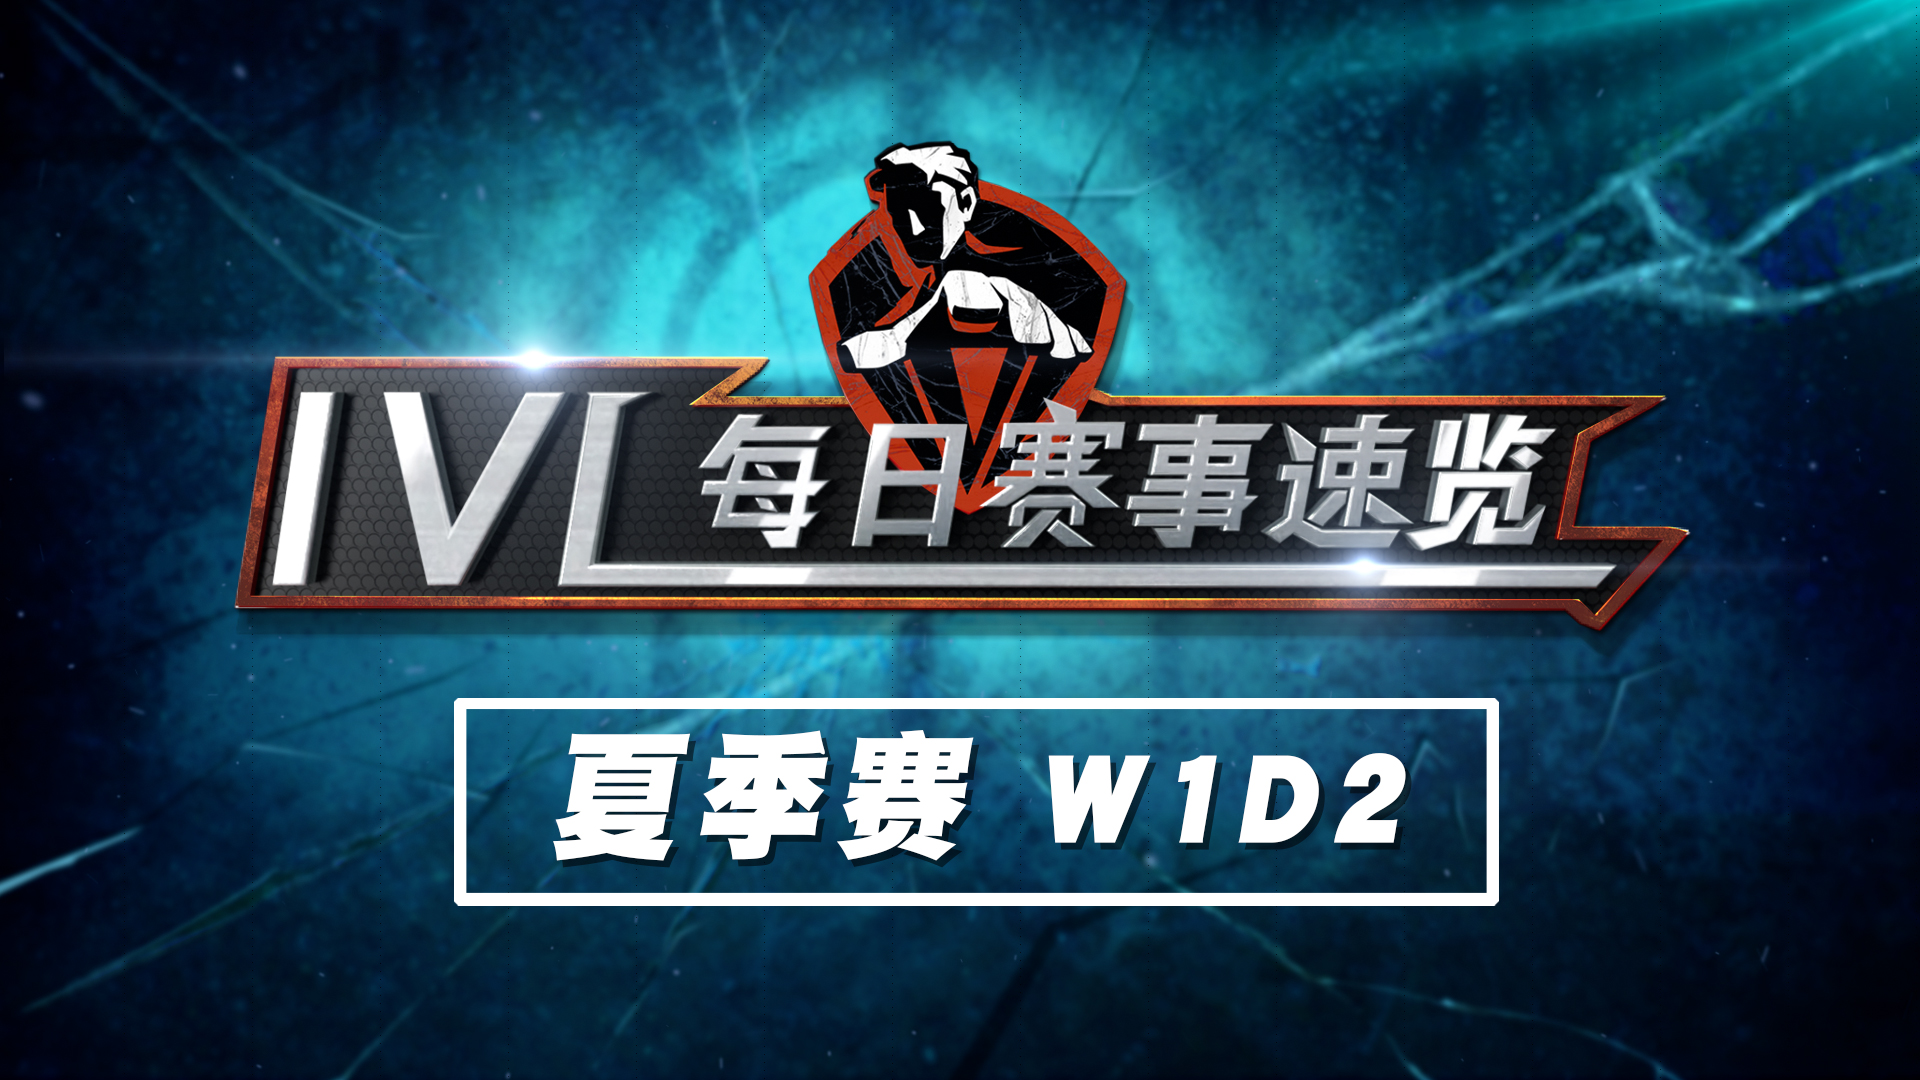 【2020IVL】夏季赛W1D2赛事速览